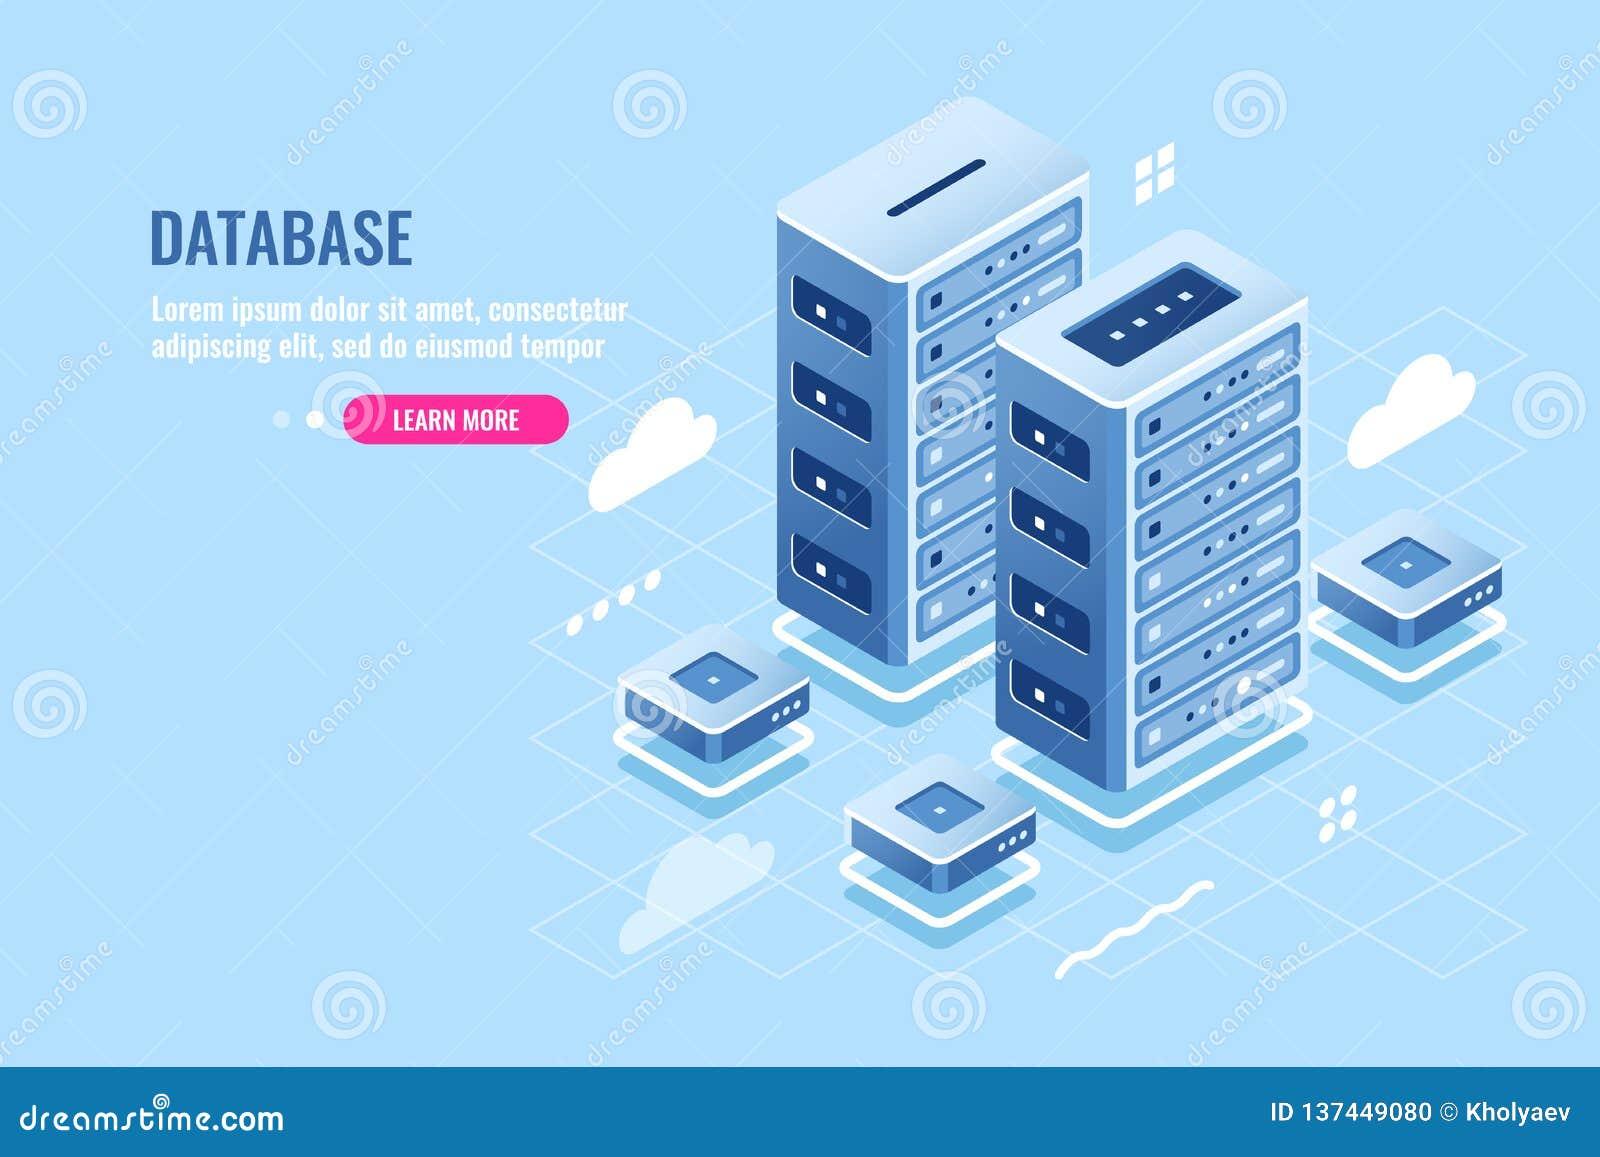 Комната сервера, хостинг вебсайта, хранение облака, база данных и значок центра данных равновеликий, технология blockchain цифров